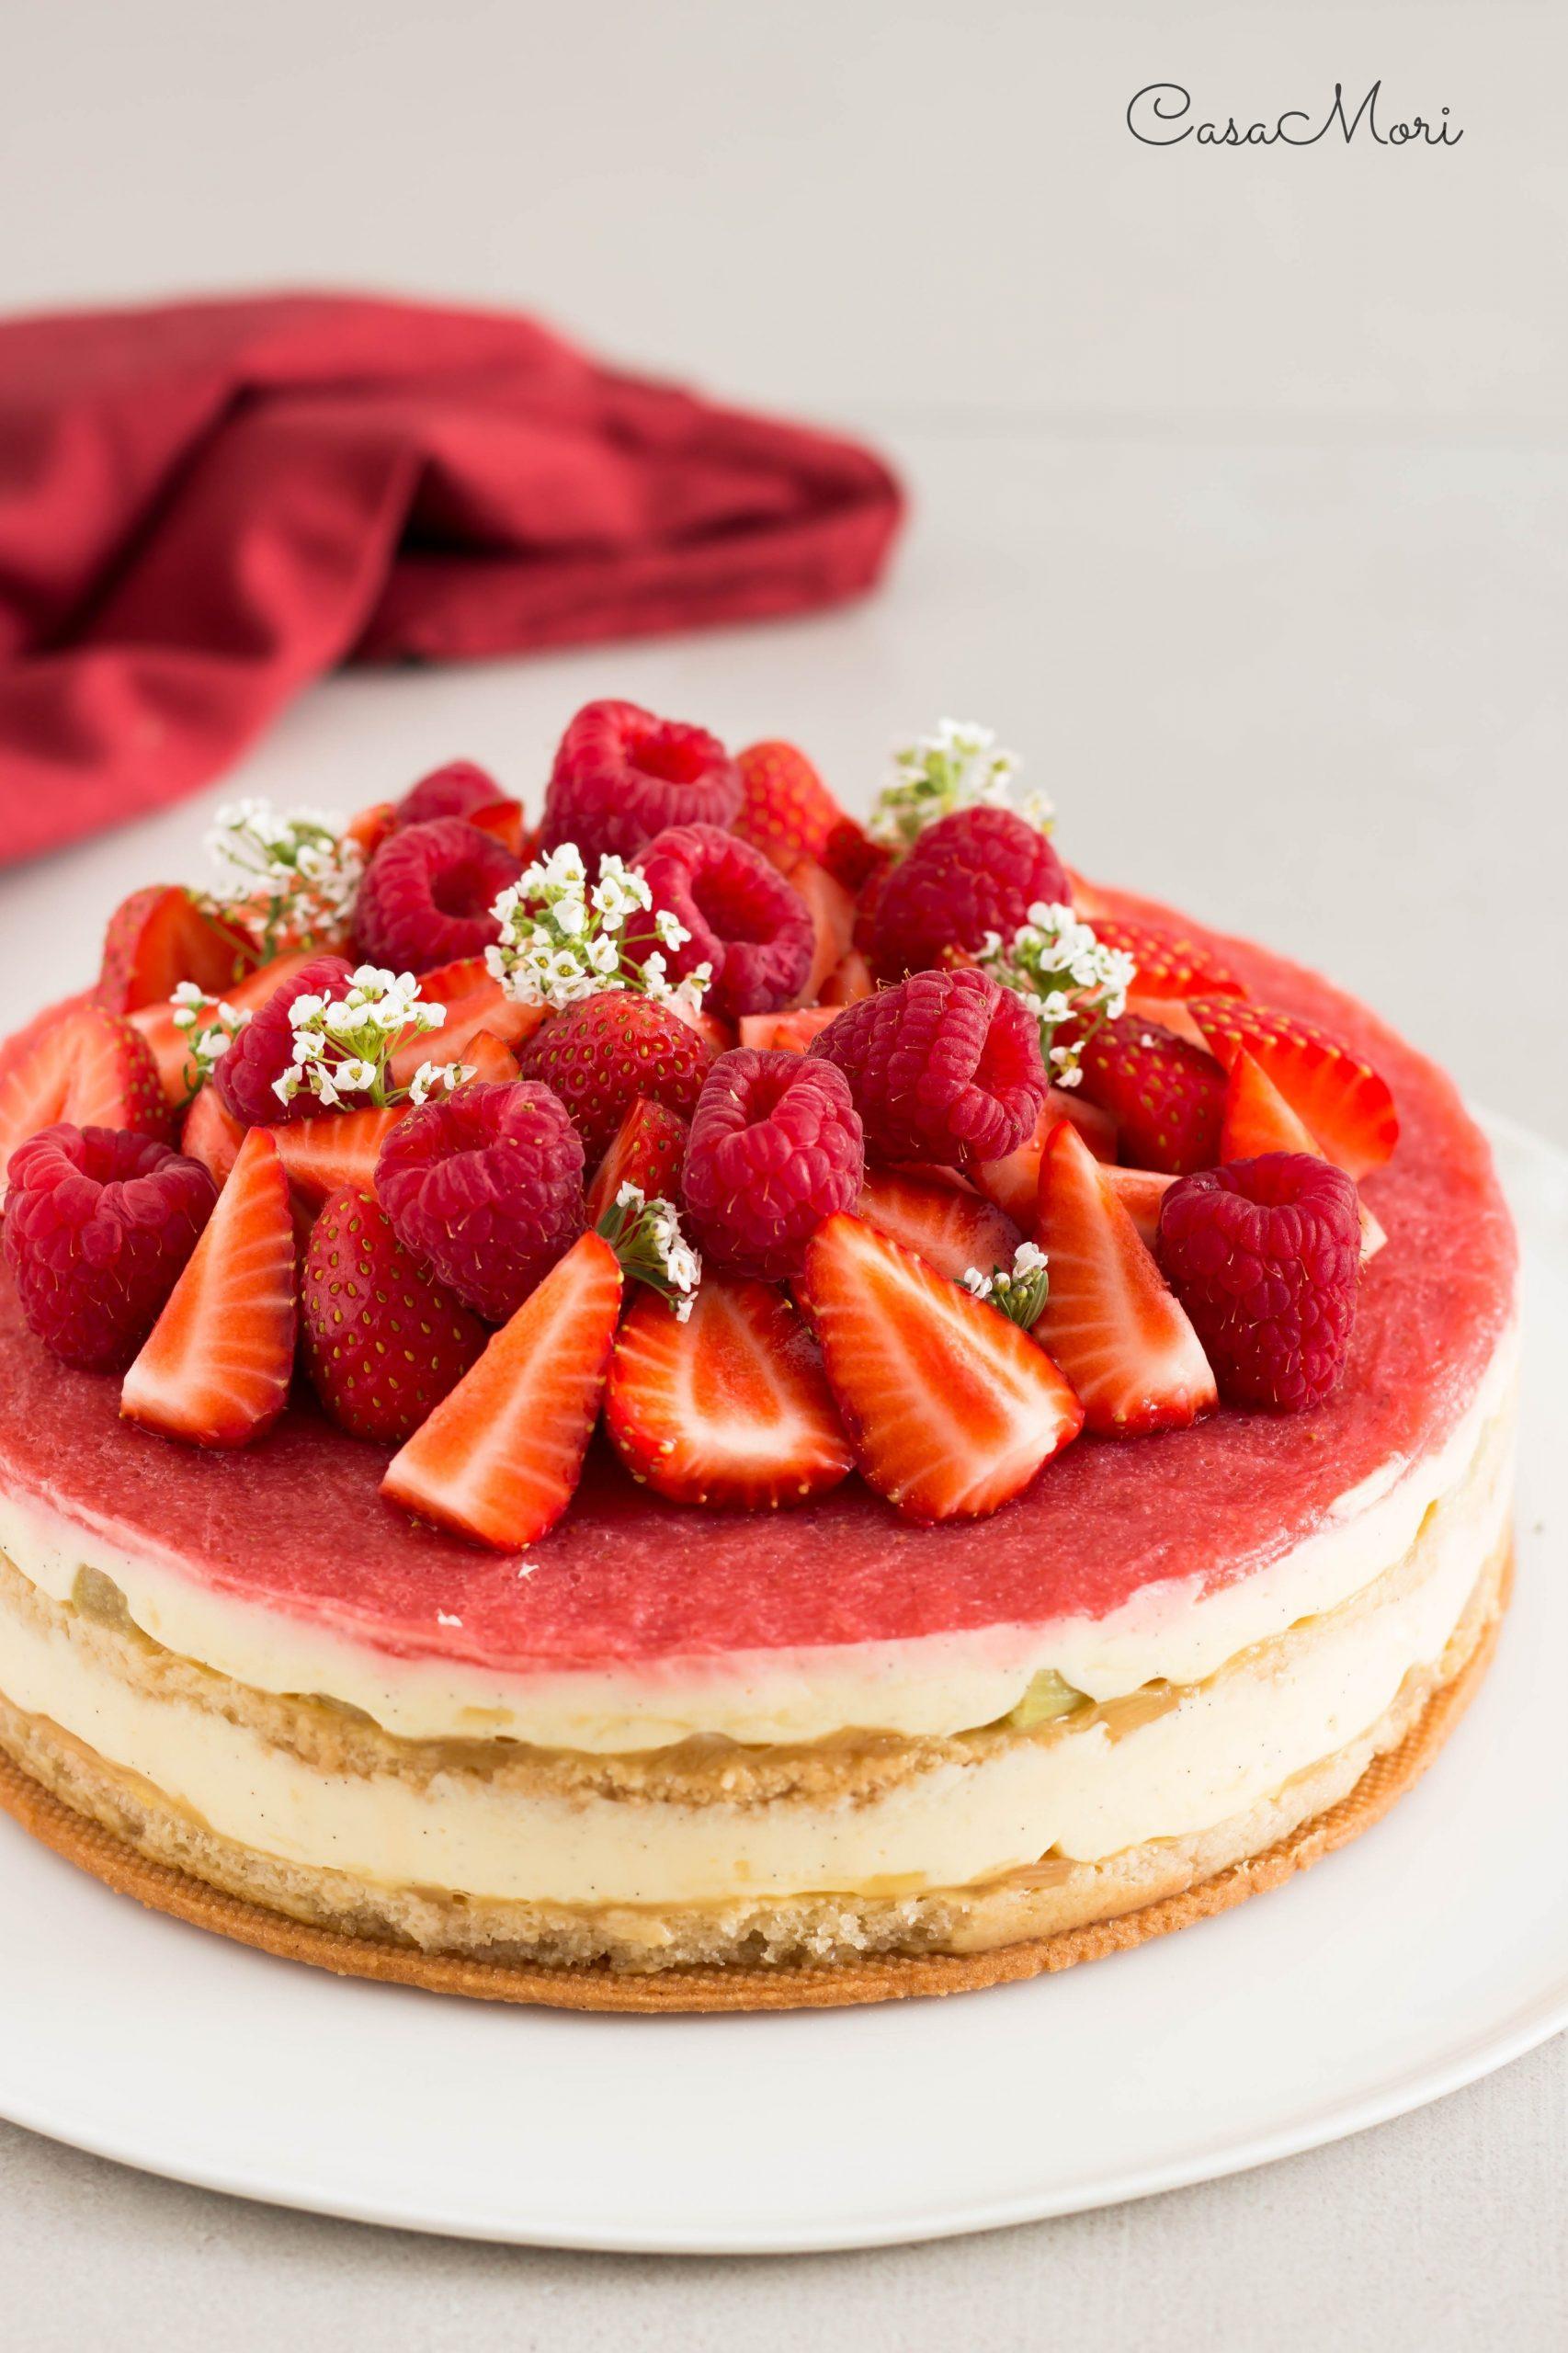 Torta aTorta al rabarbaro e fragolel rabarbaro e fragole